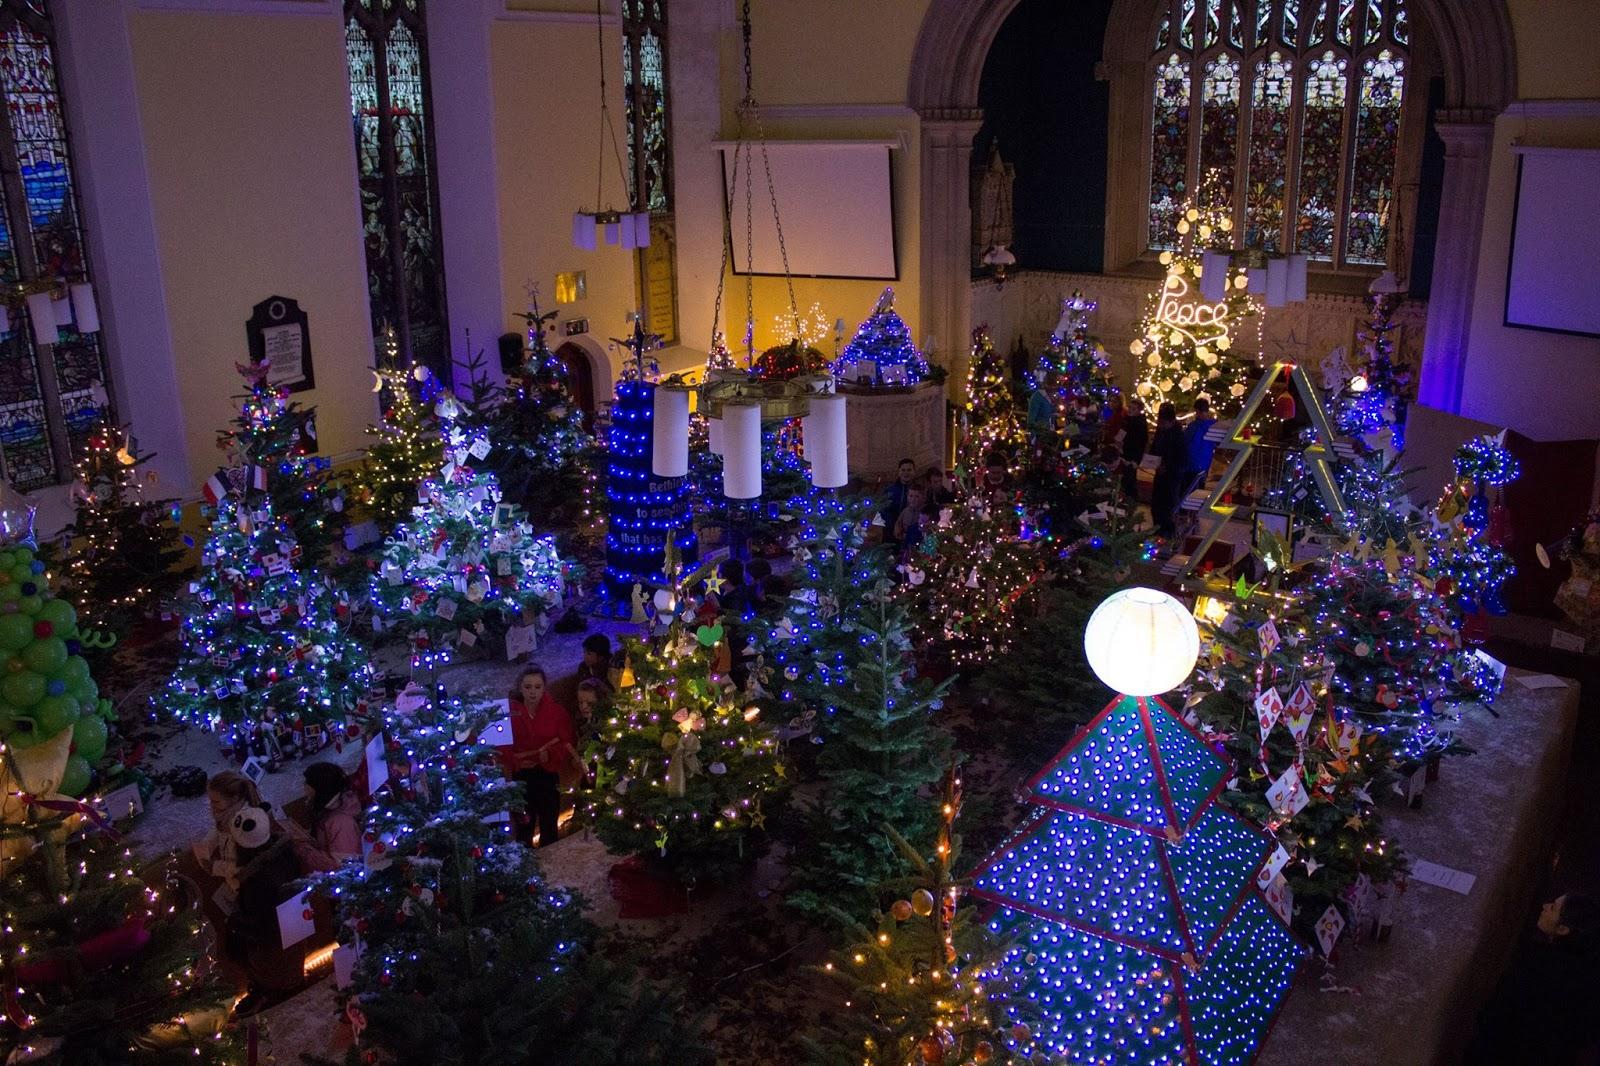 Christmas tree festival at Crinken Church